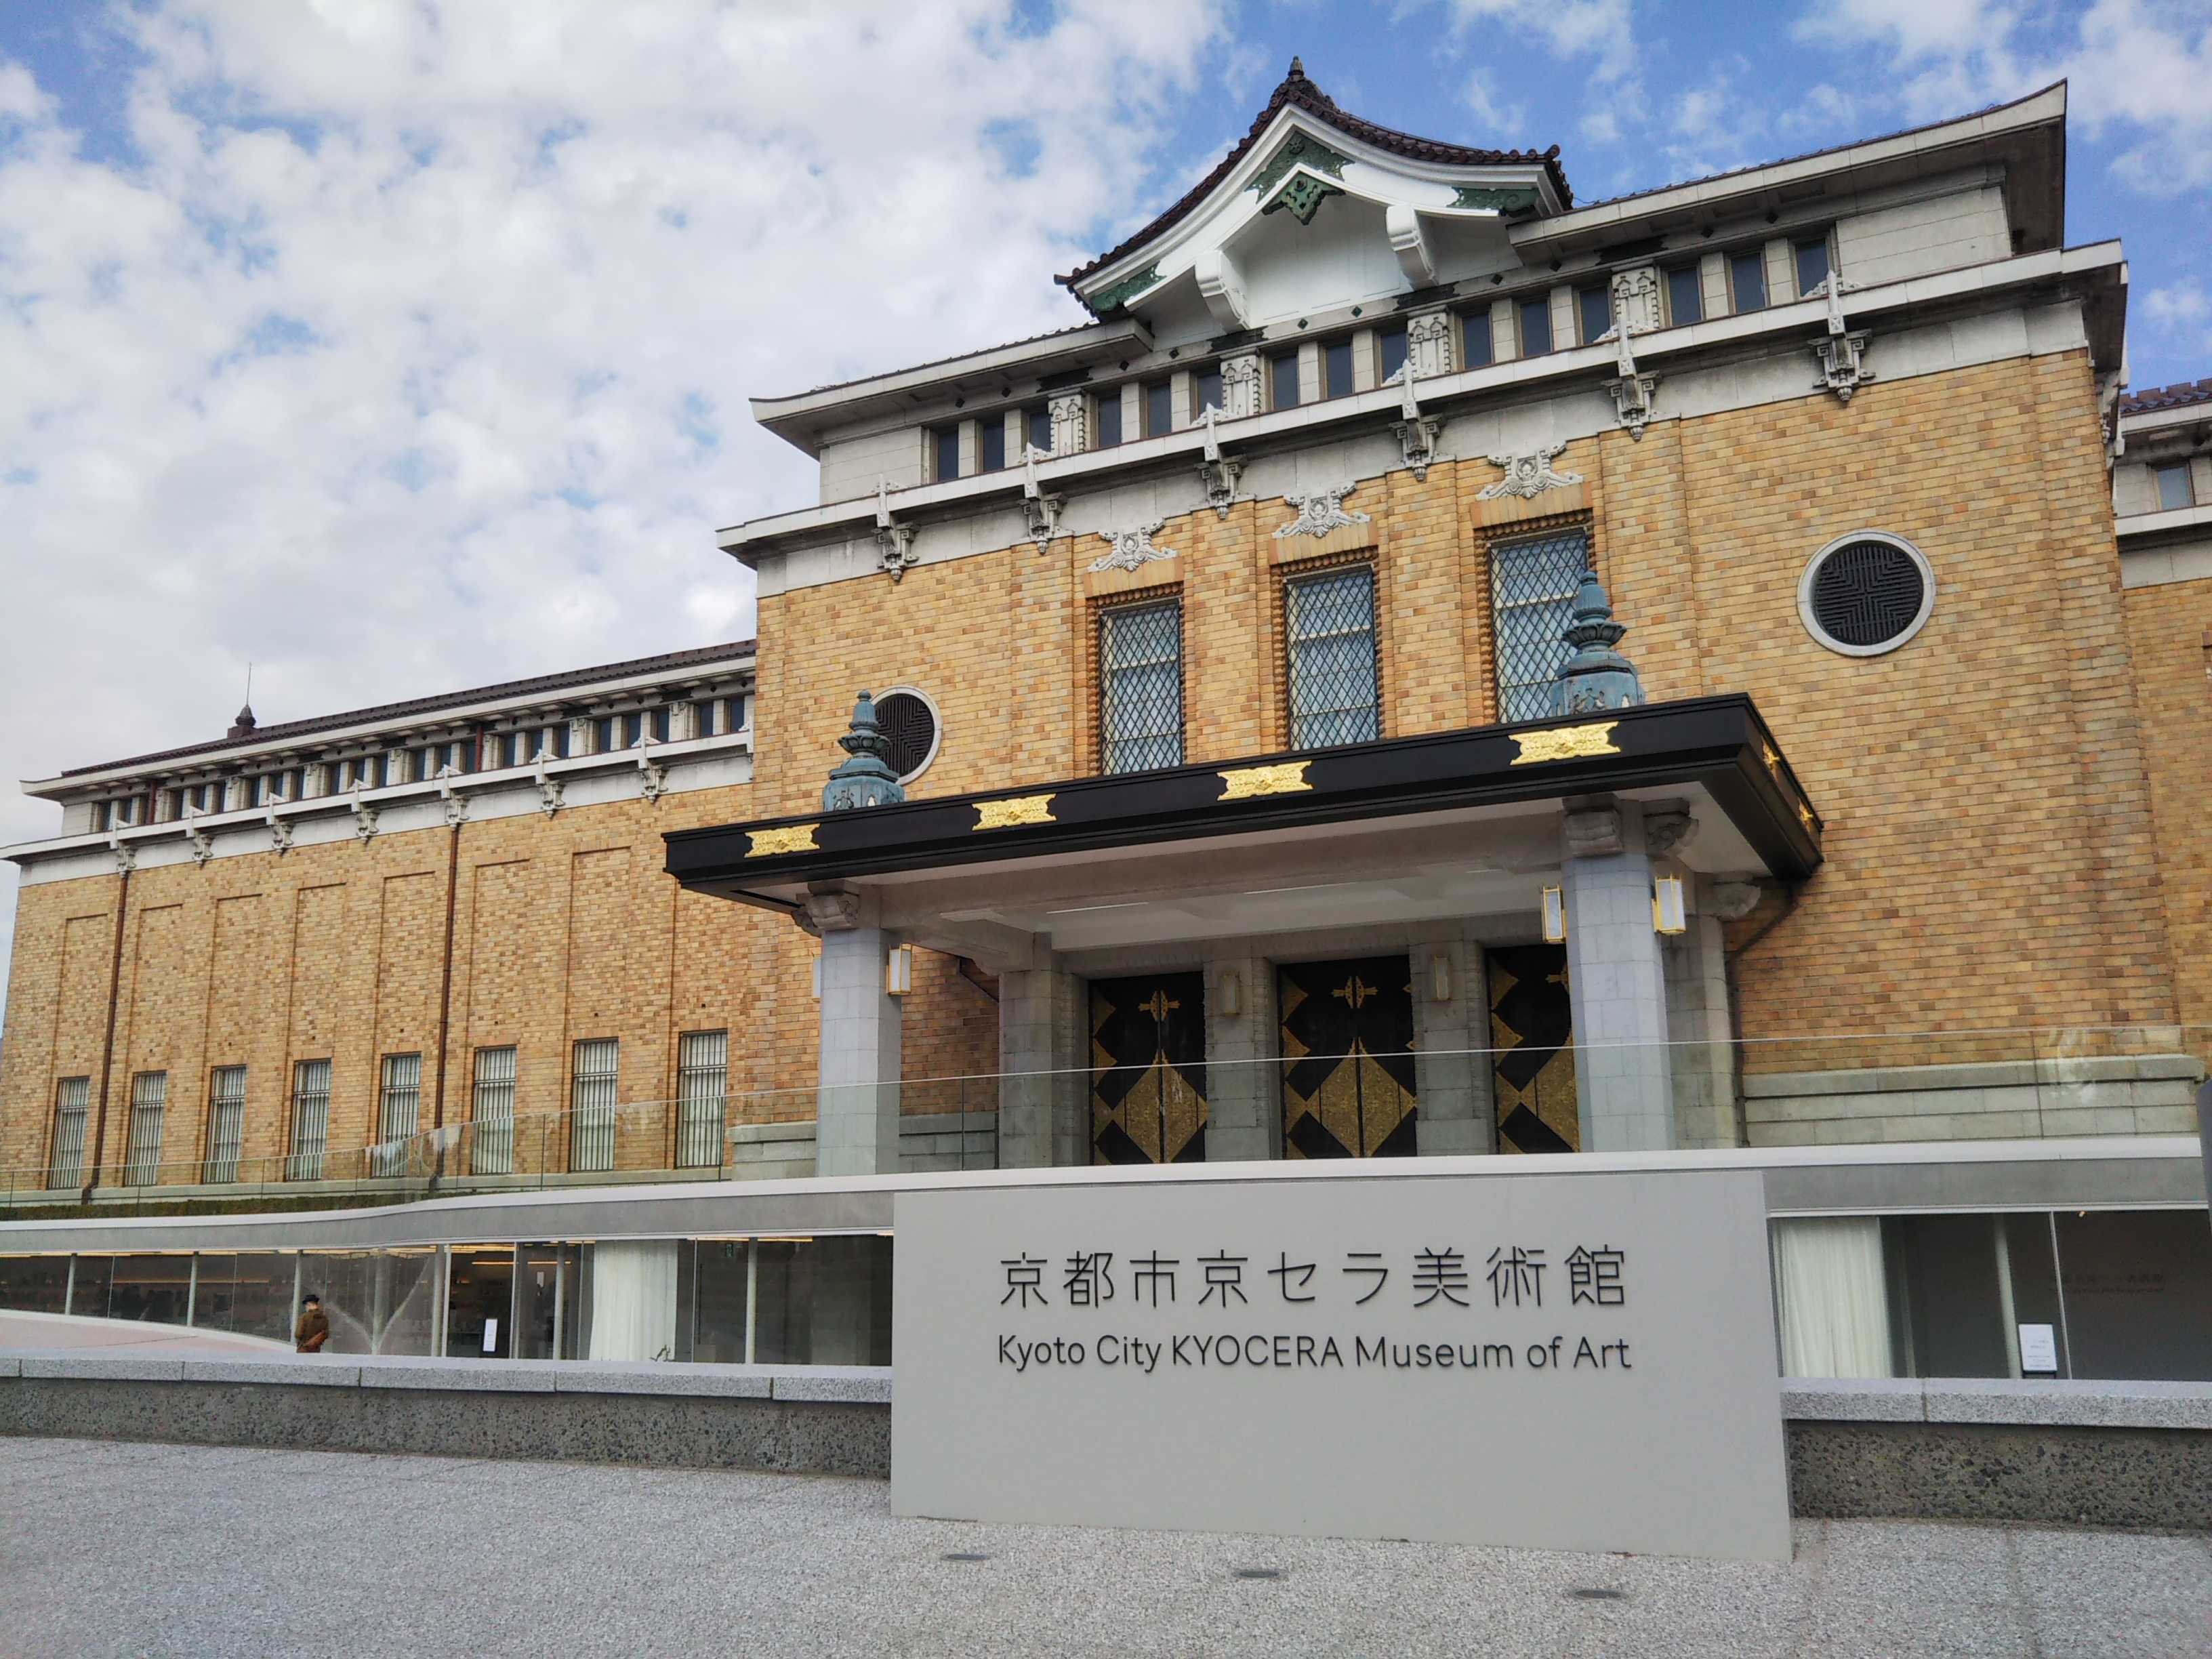 京都市京セラ美術館 Photo: ARTLOGUE